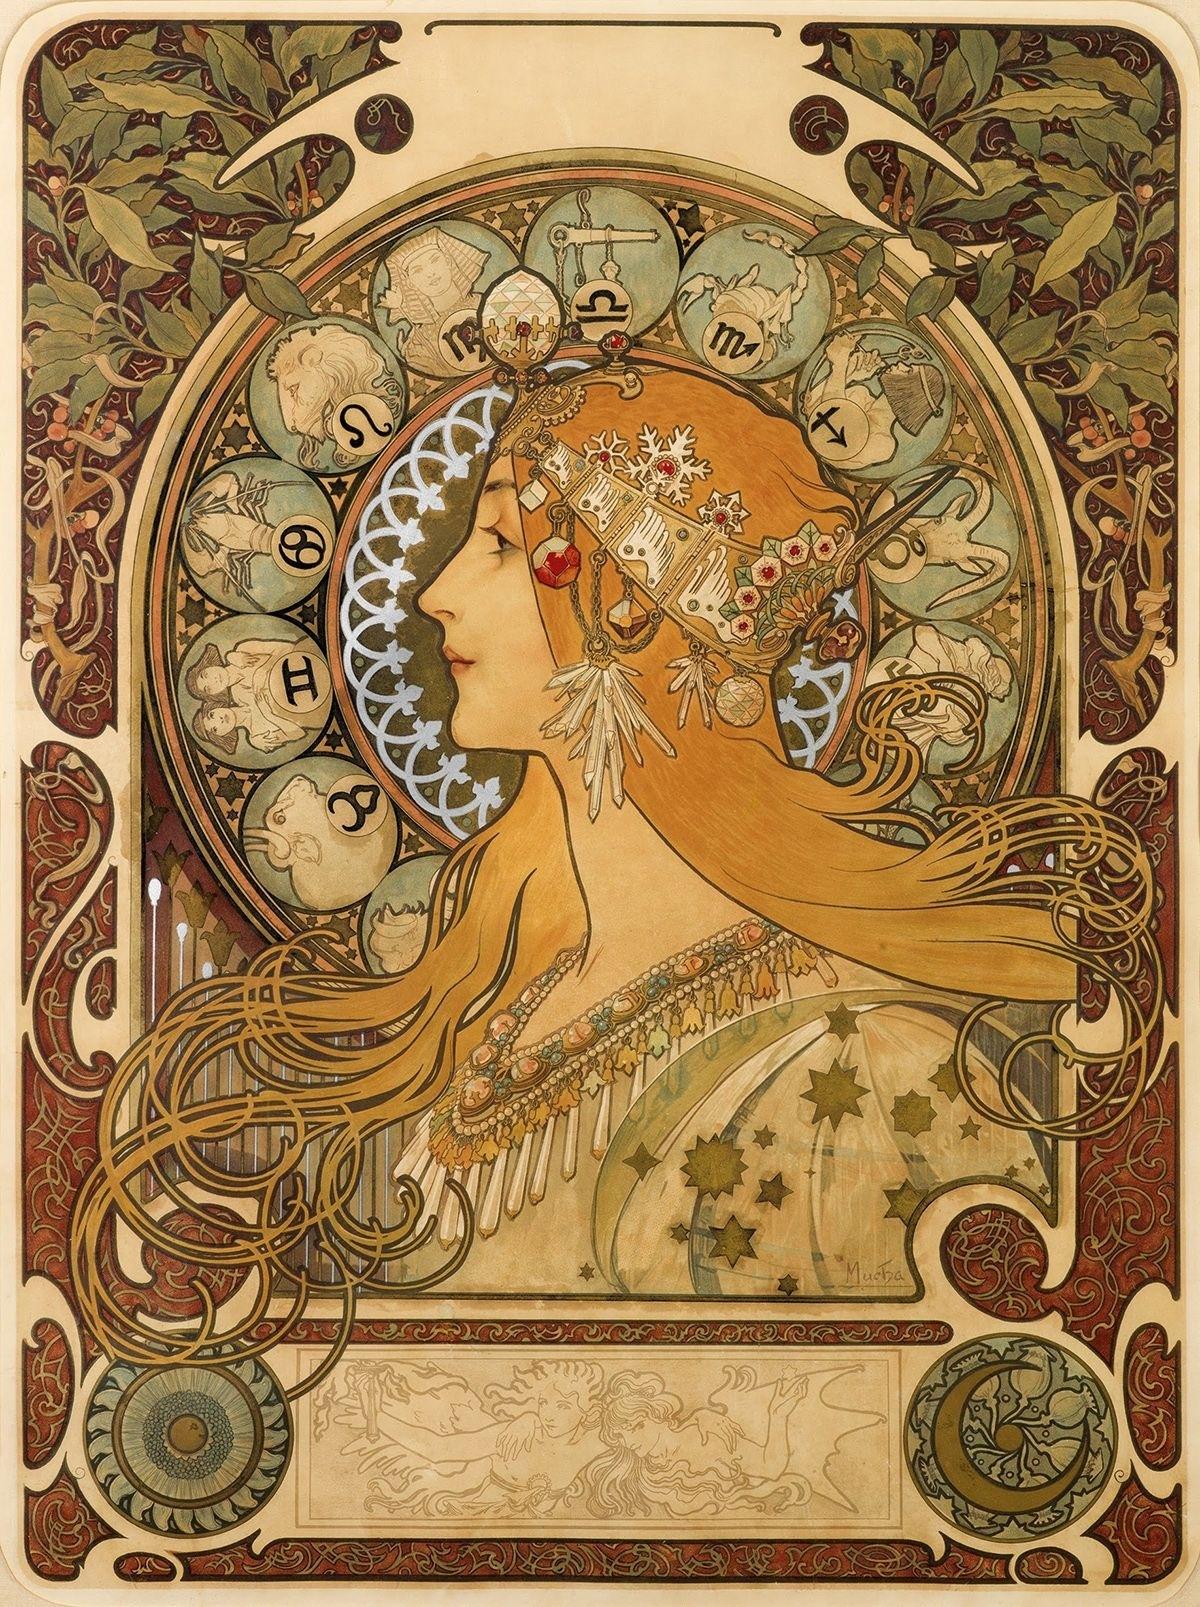 Alphonse Mucha, La Plume — Zodiac Calendar, 1897 | Art Zodiac Calendar By Alphonse Mucha